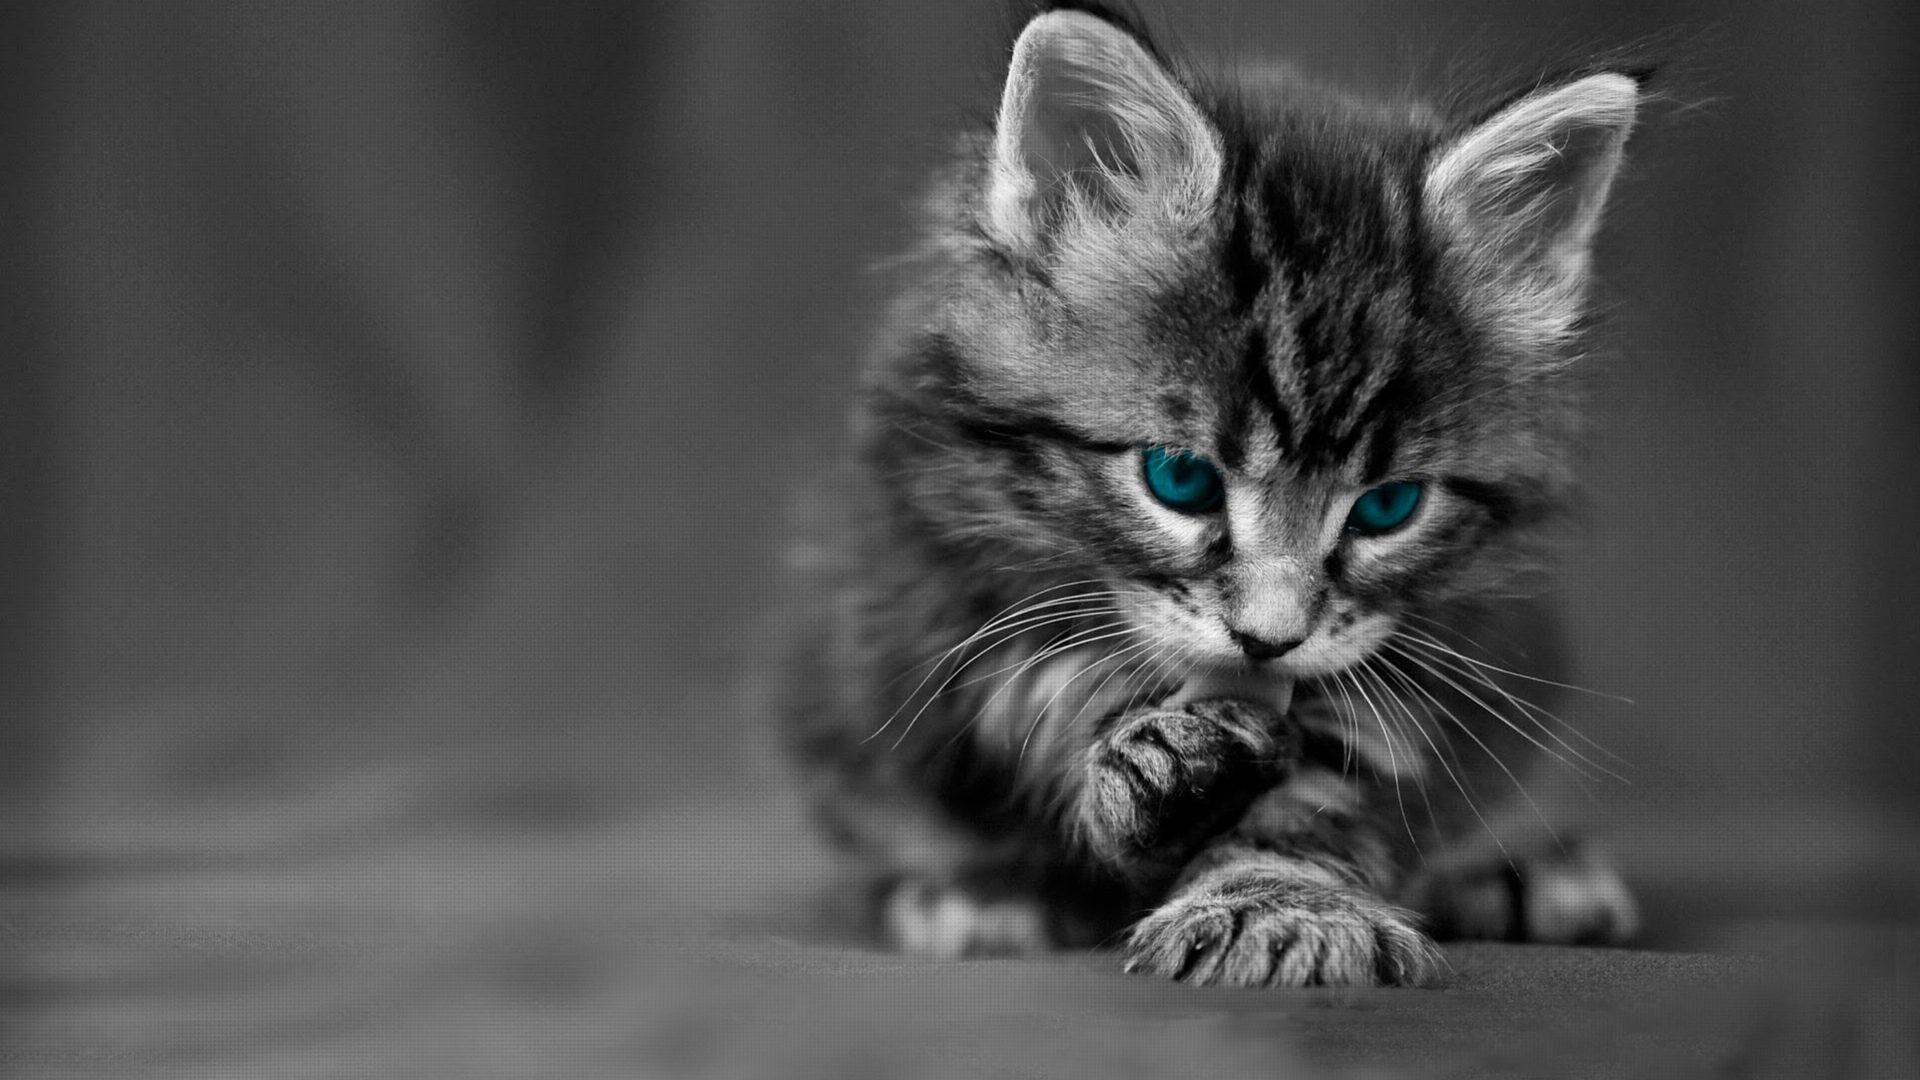 Cute Kitten Christmas Wallpaper Desktop Wallpaper Hd Gray Kitten With Blue Eyes